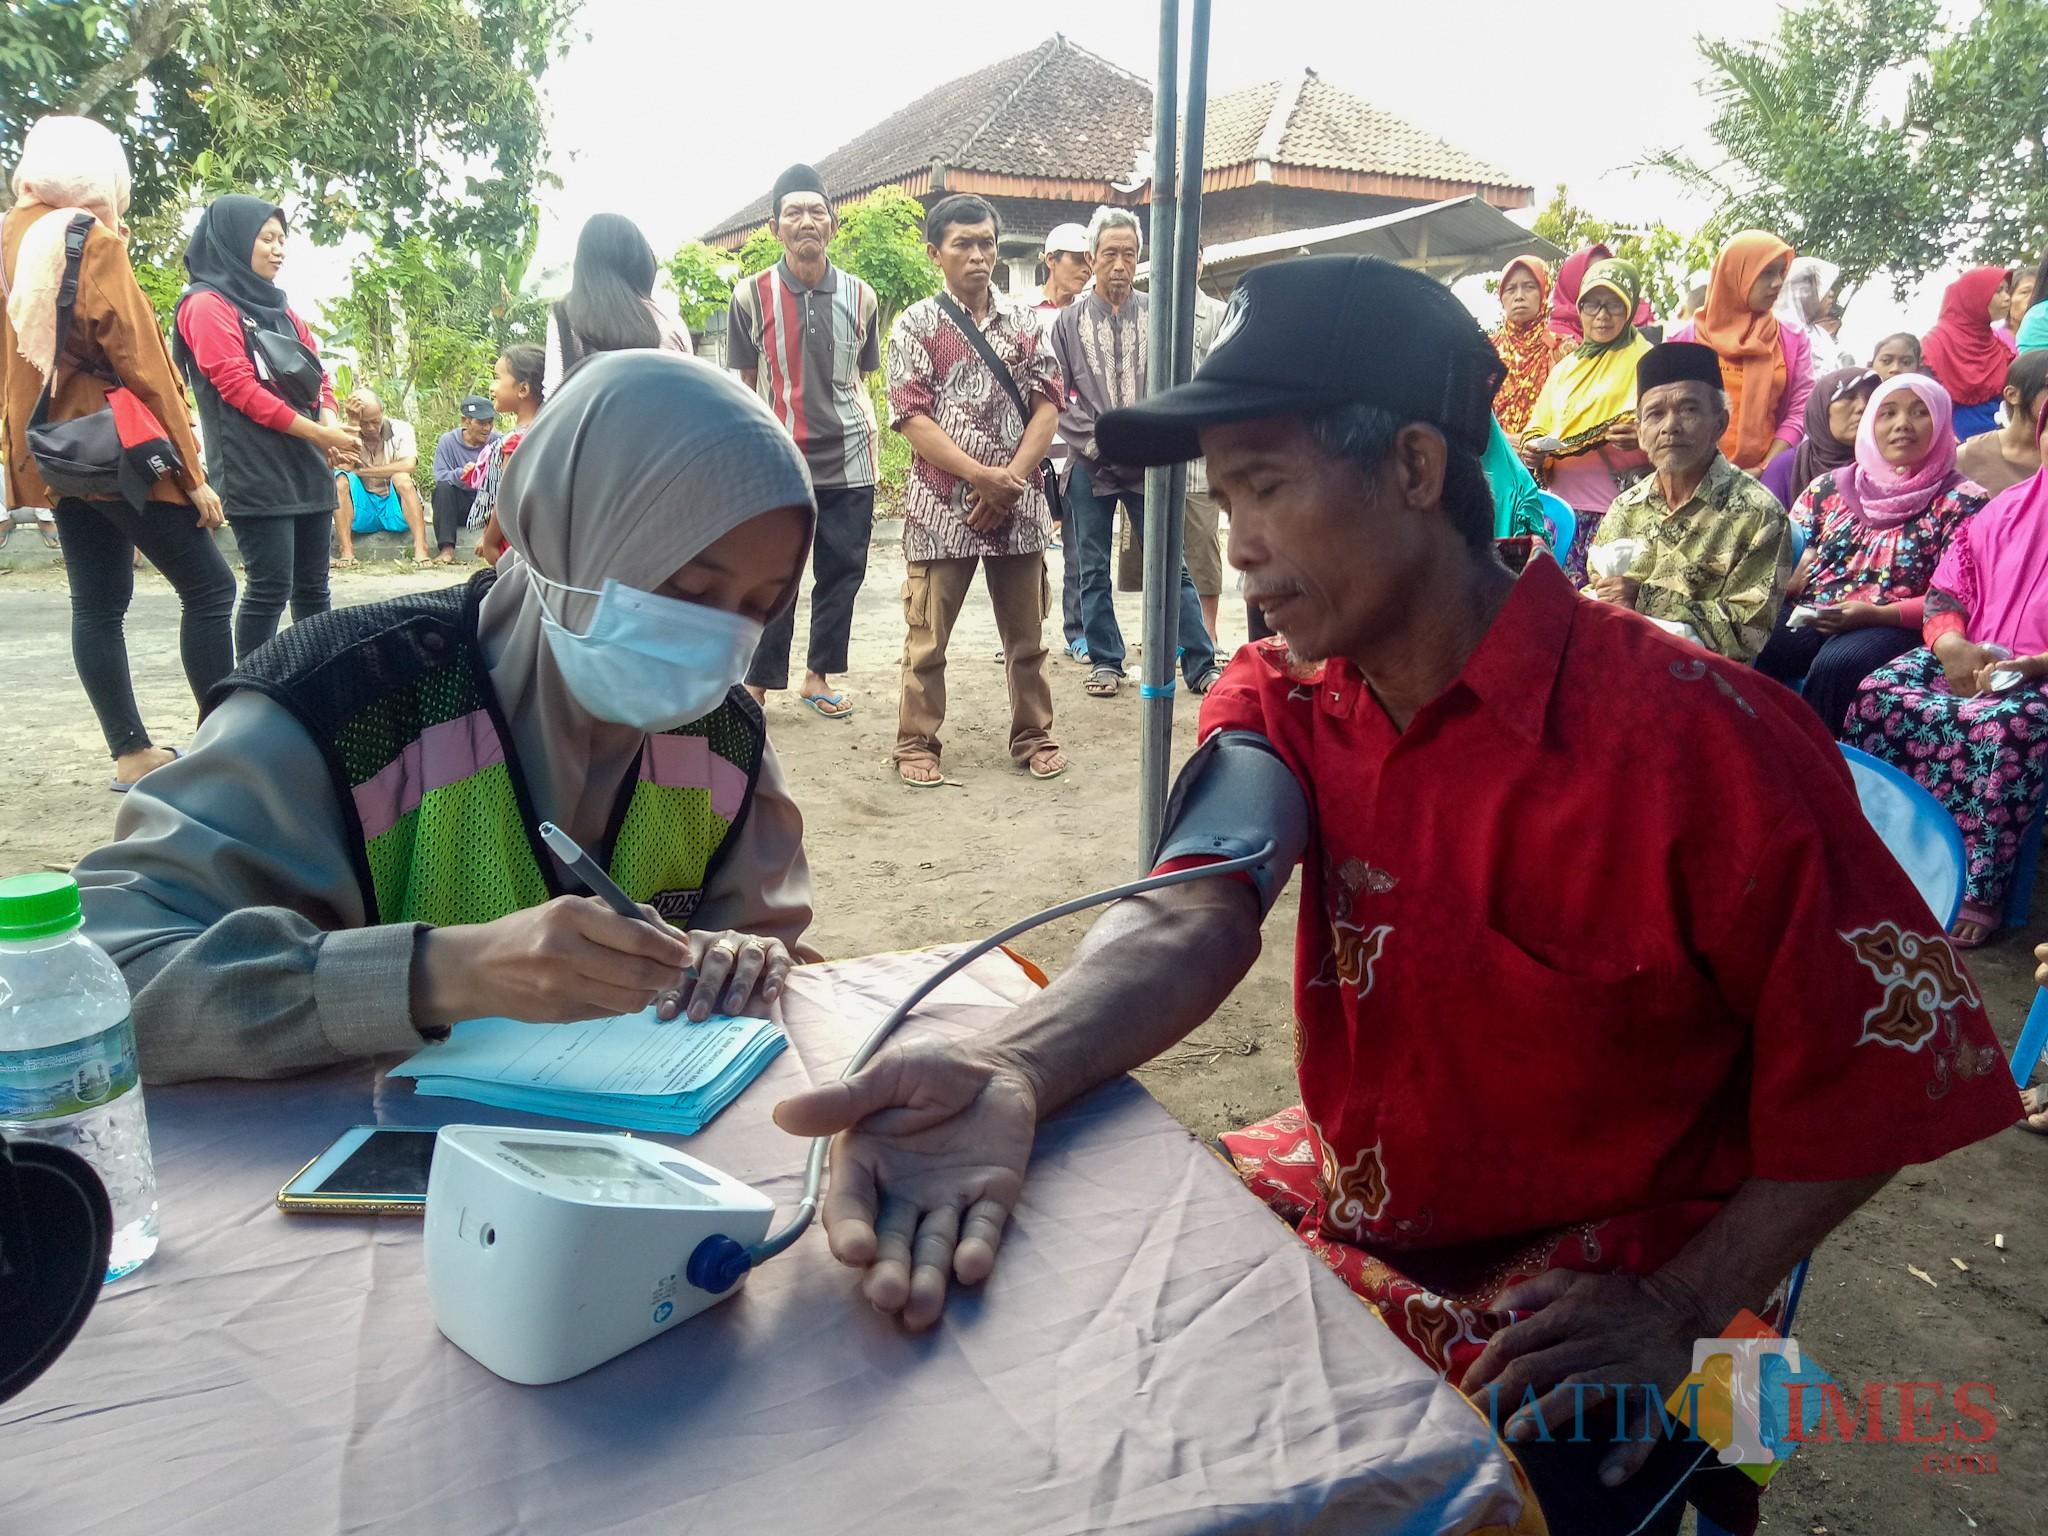 Salah satu warga dusun Lebaksari yang menjalani pemeriksaan kesehatan. (Foto: Imarotul Izzah/MalangTIMES)